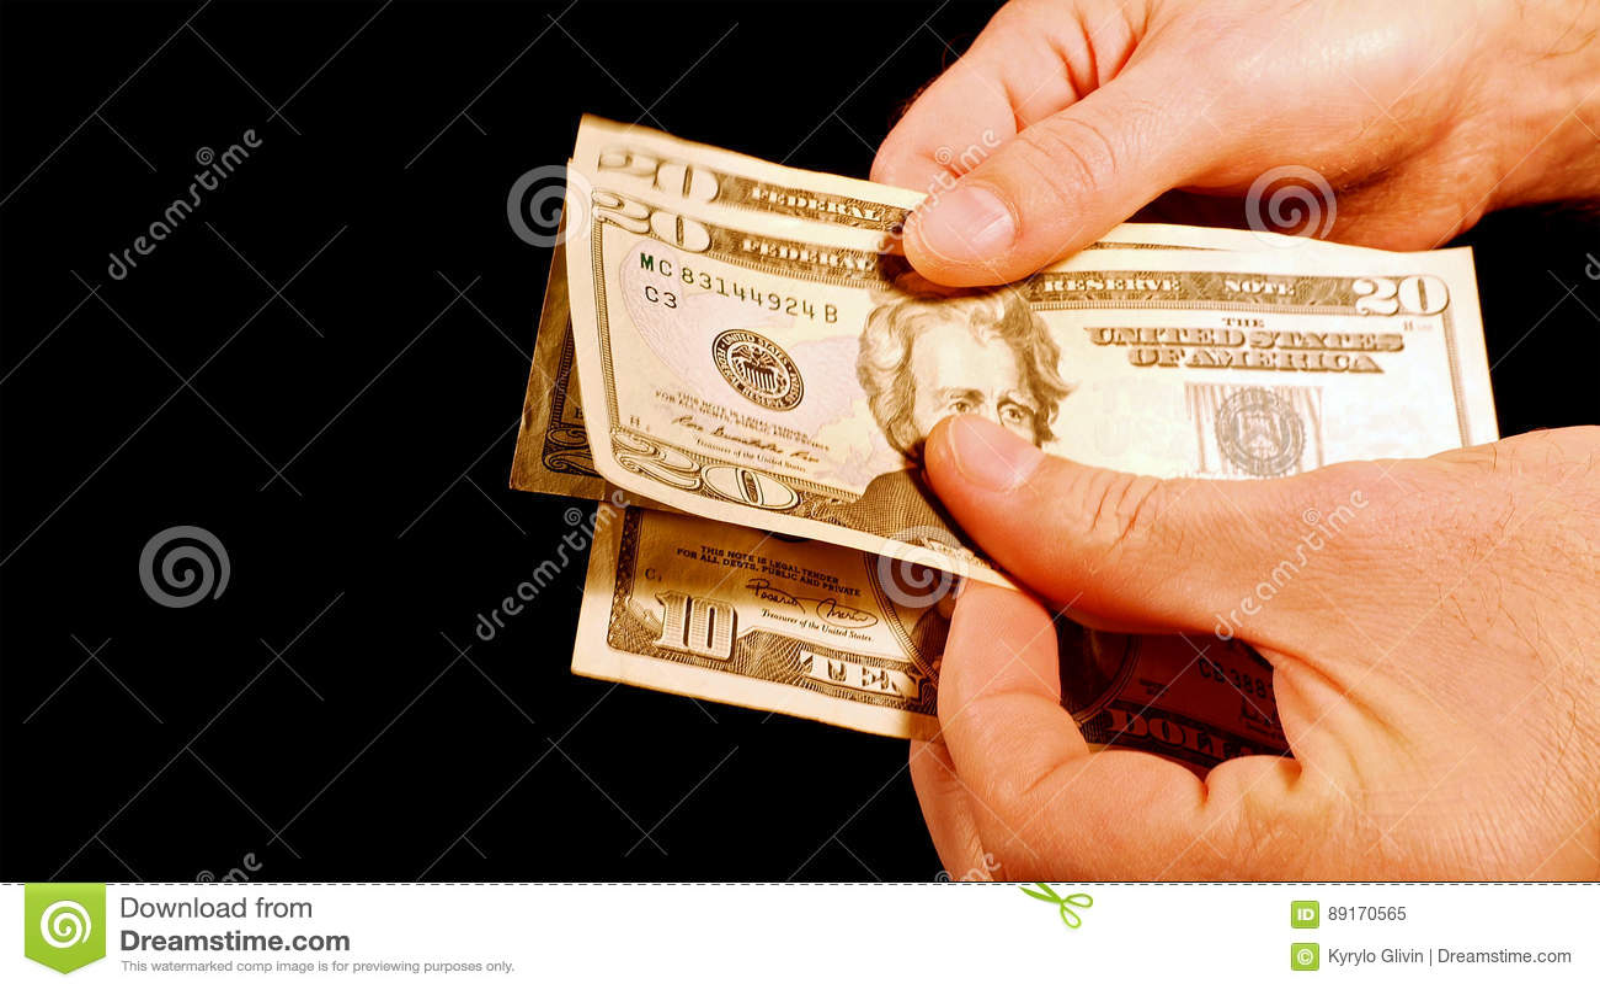 Counting Money Cash Dollars Bills In Hands Stock Image